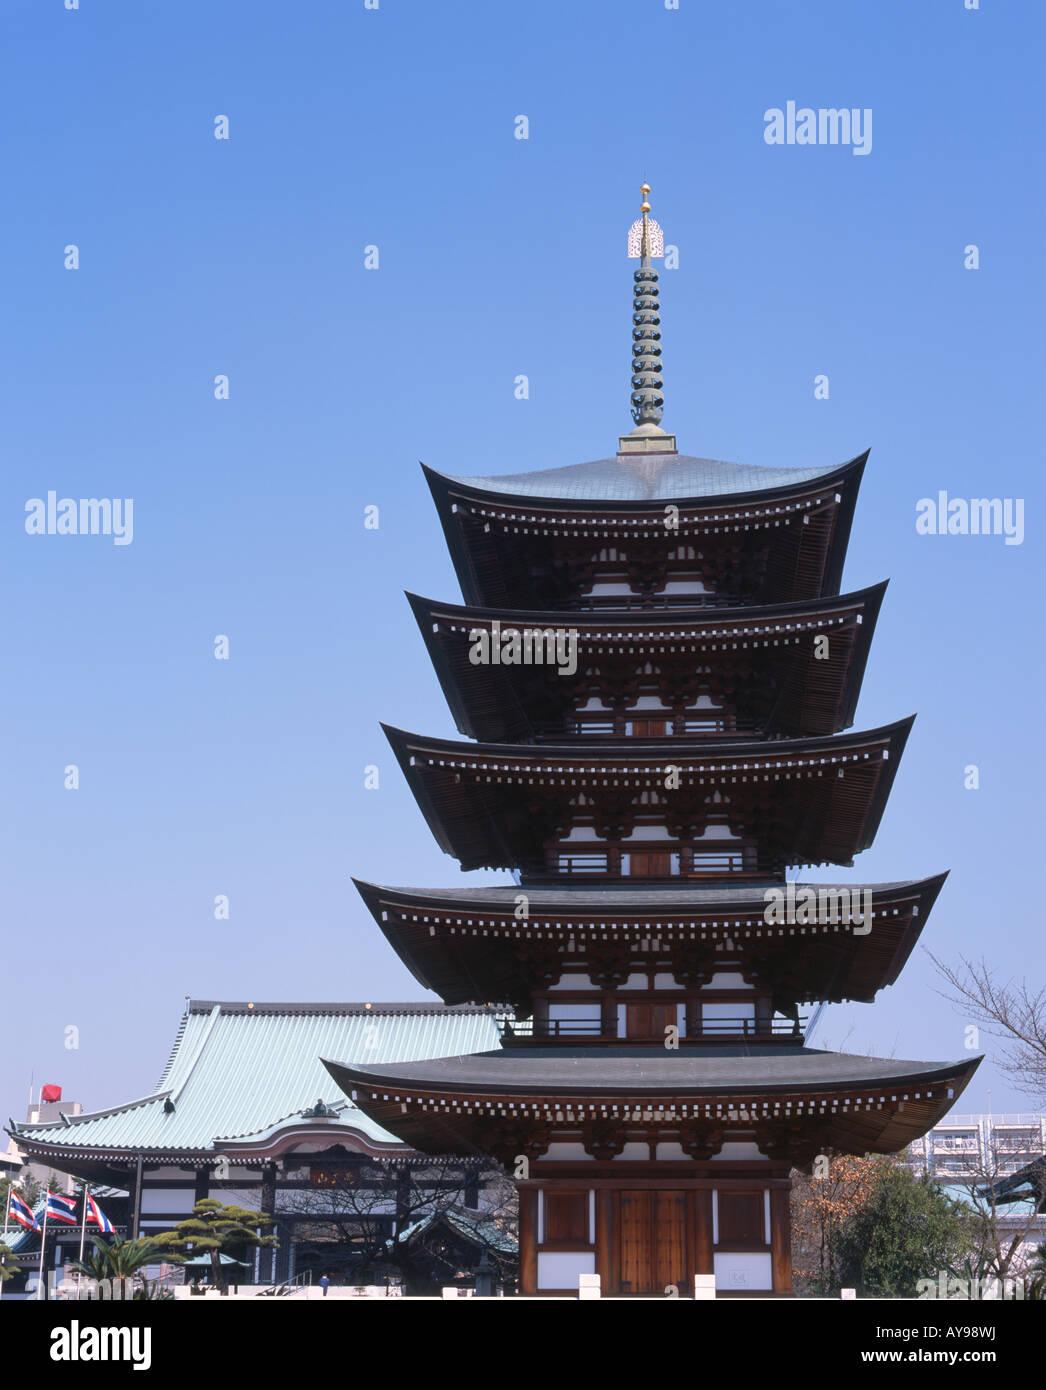 Five story pagoda of Nittaiji Temple, Nagoya - Stock Image